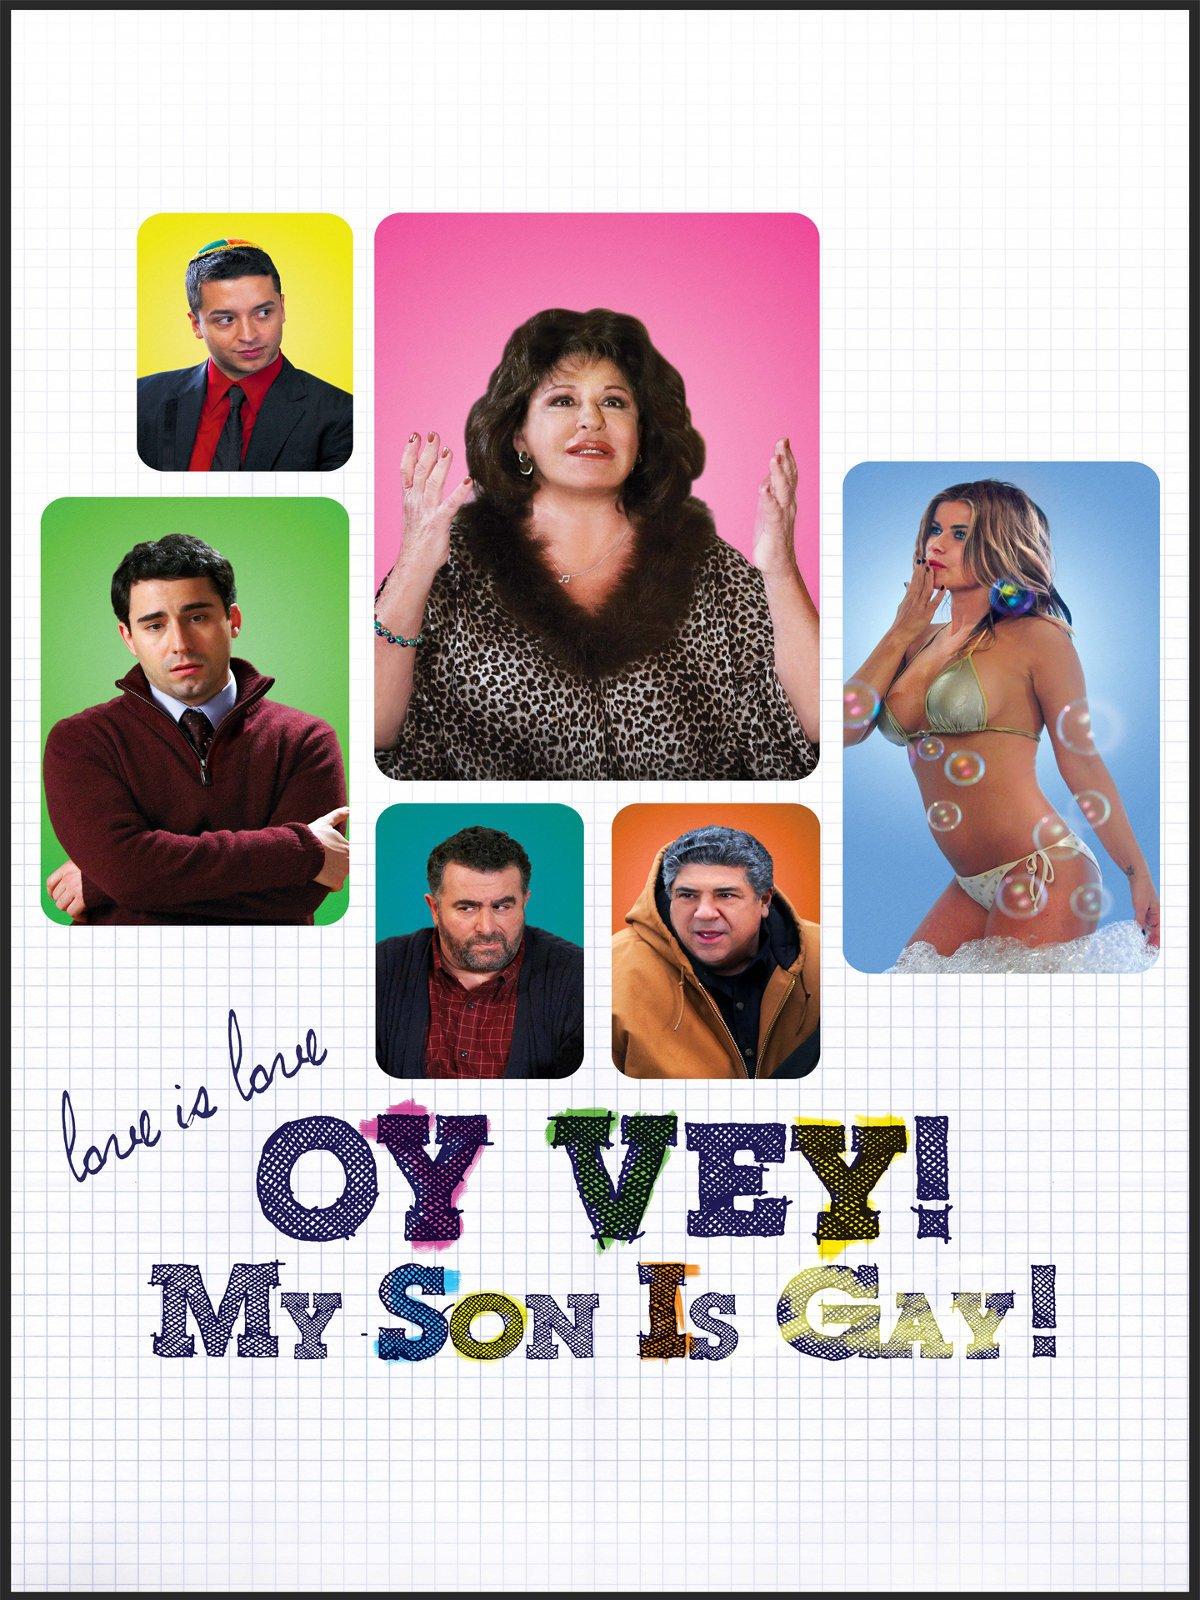 Oy Vey! My Son Is Gay! (2009) Hindi Dual Audio 350MB HDRip 480p ESubs